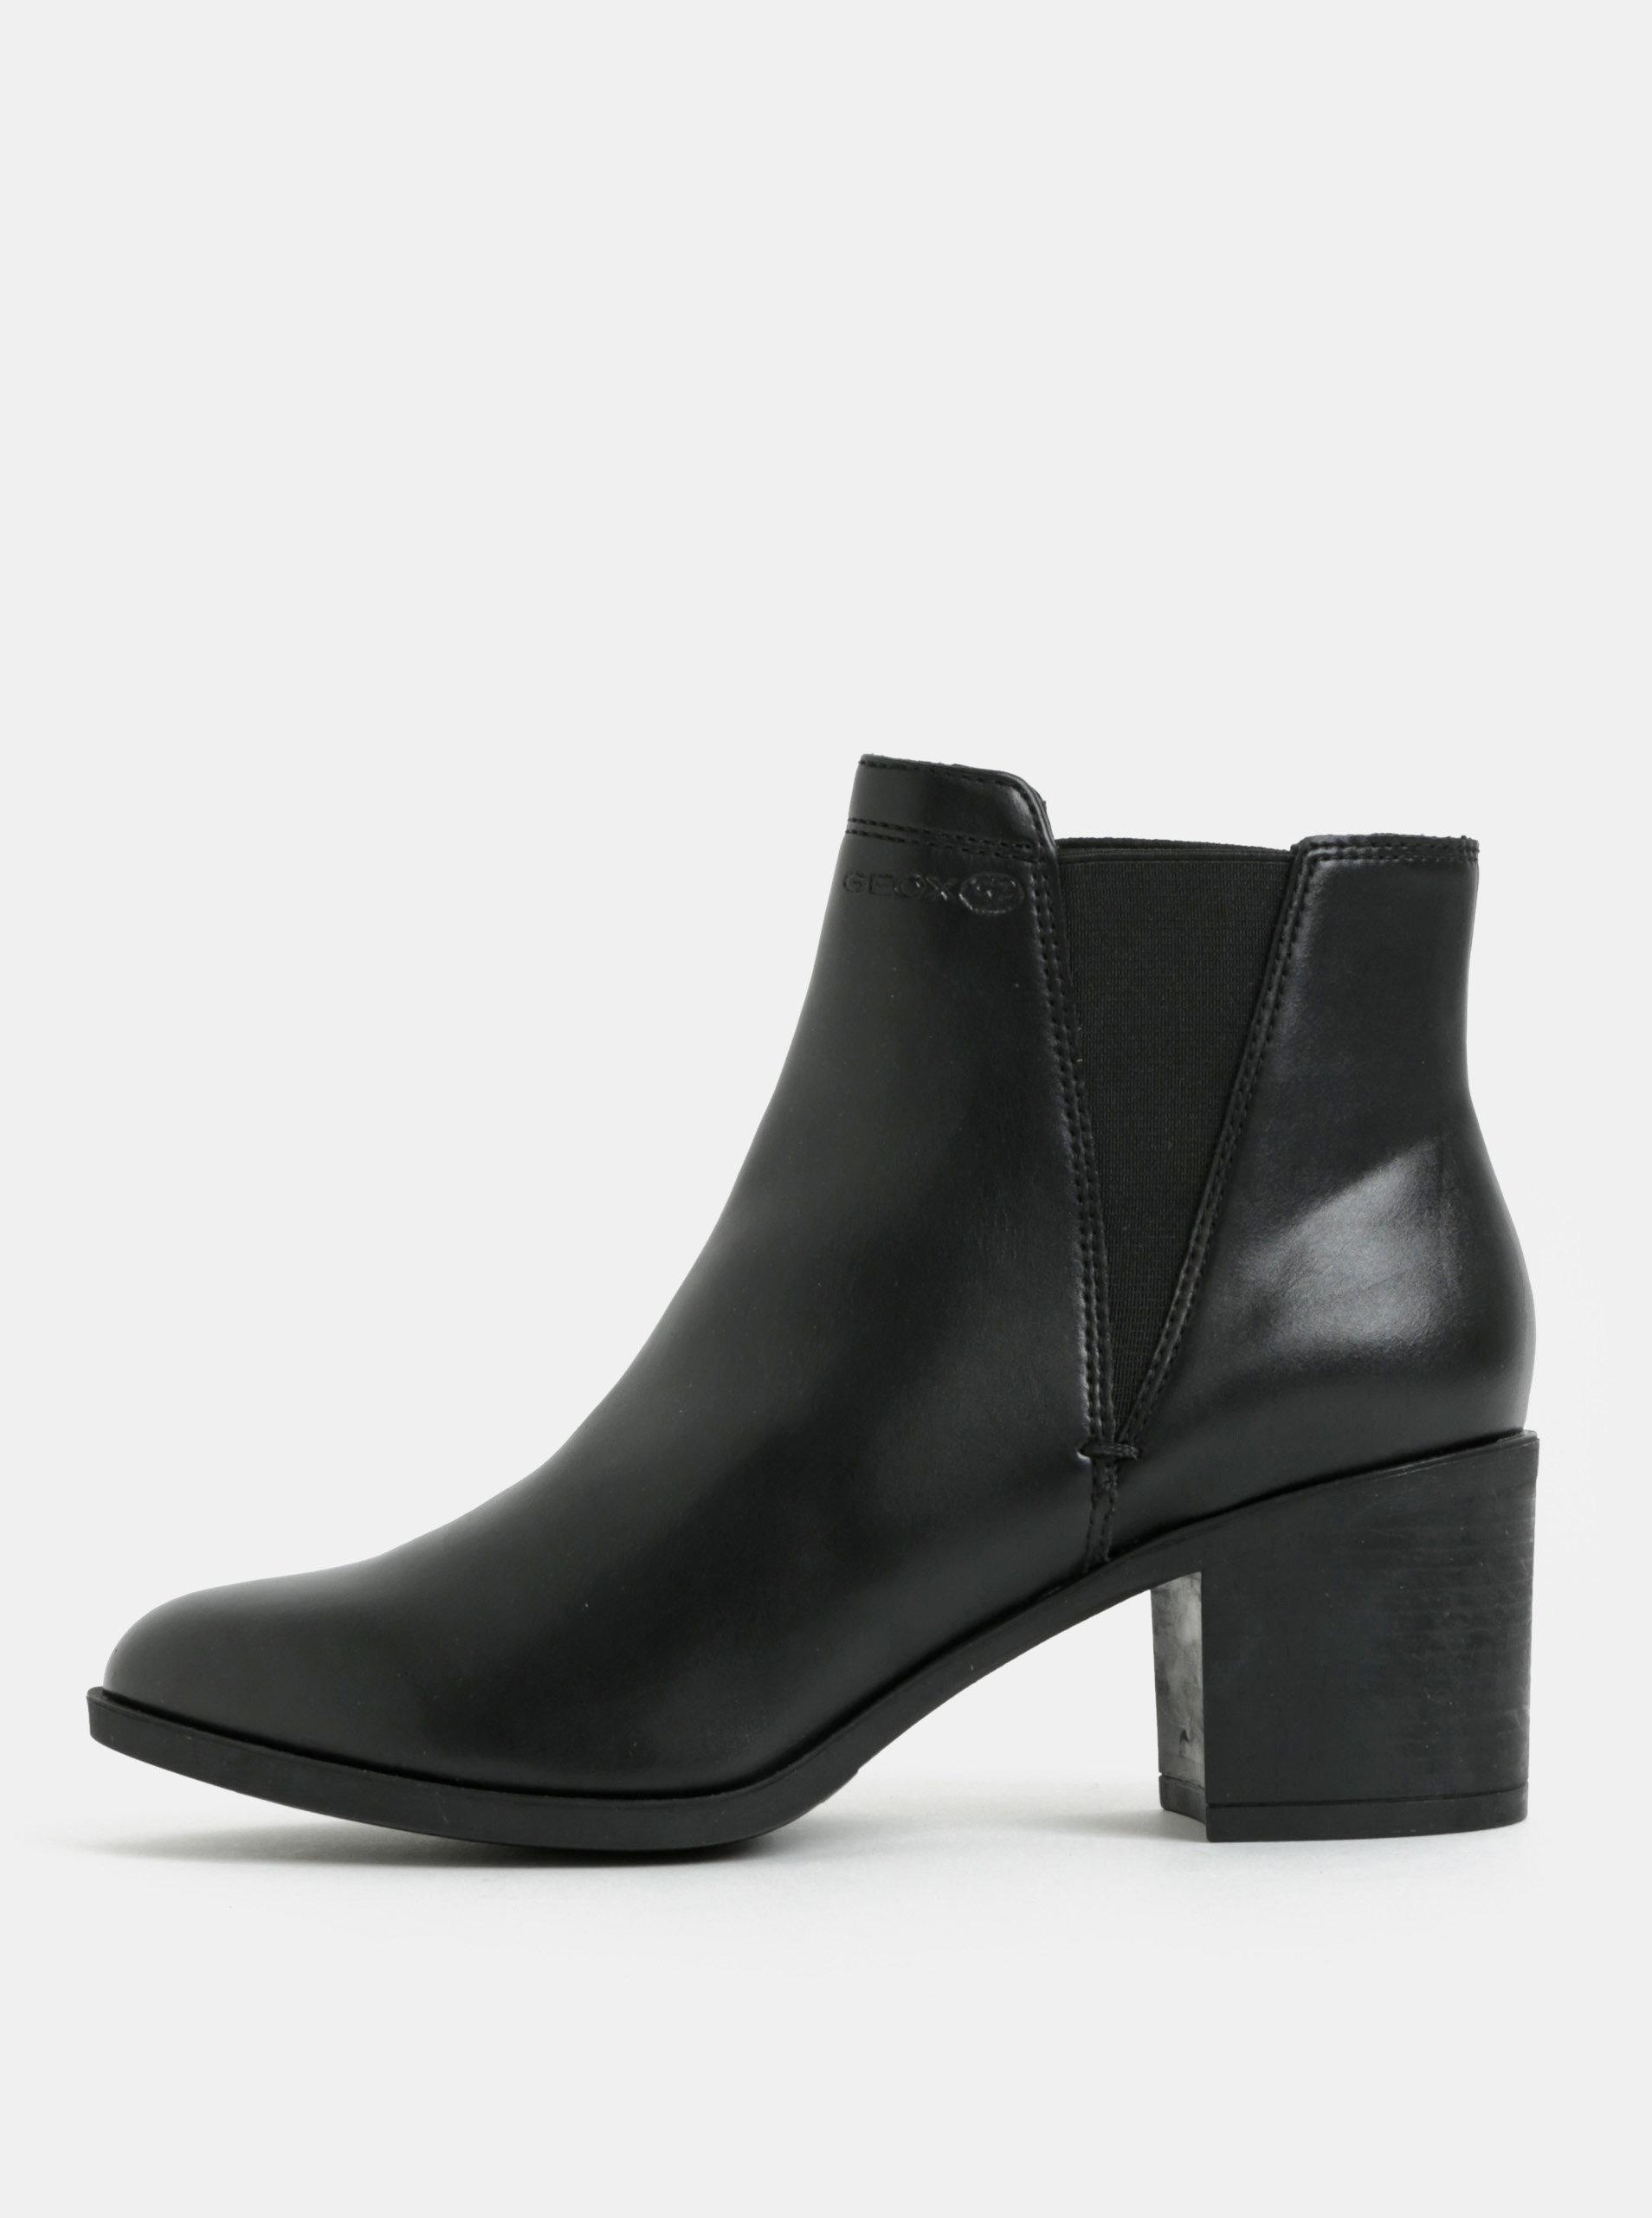 7415fa8f69 Čierne dámske členkové topánky na vysokom podpätku Geox ...